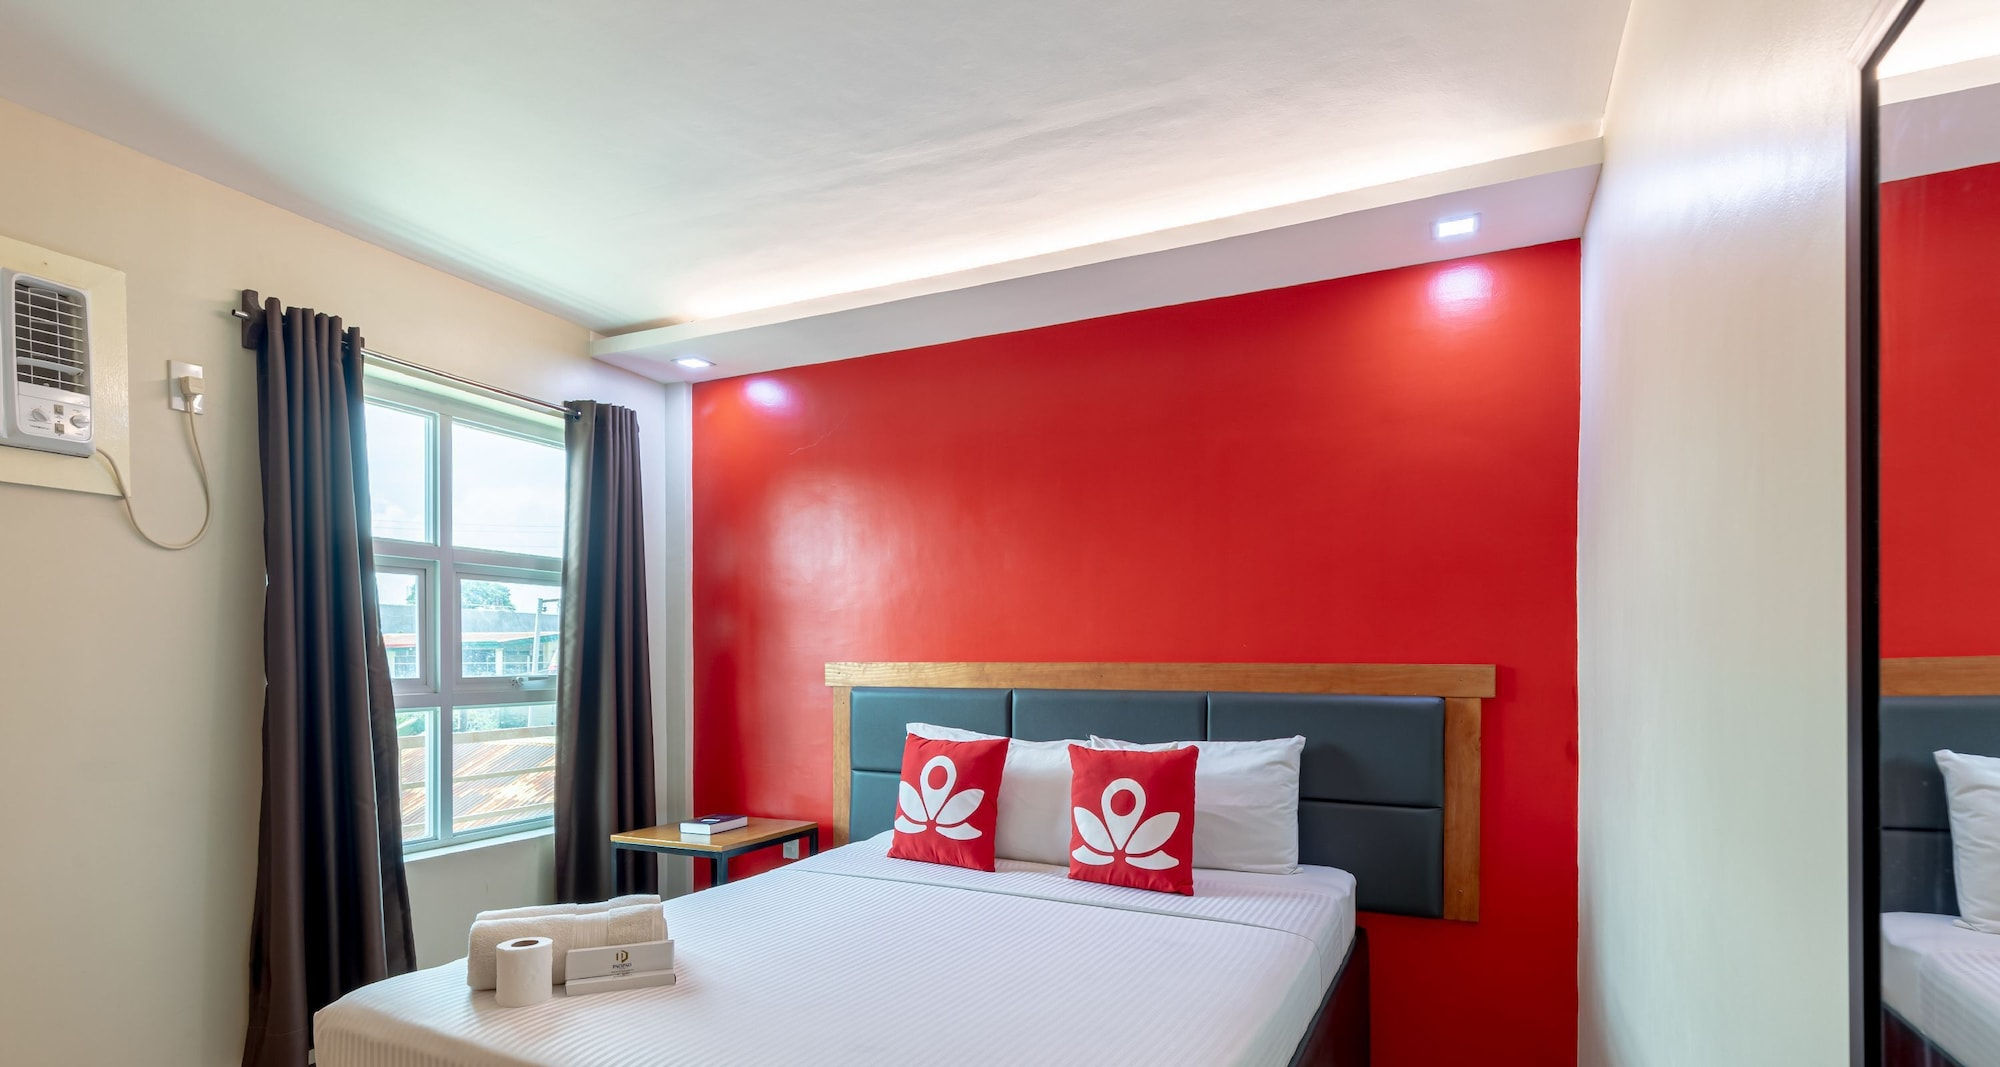 ZEN Rooms Paopao Hotel Sorsogon, Sorsogon City